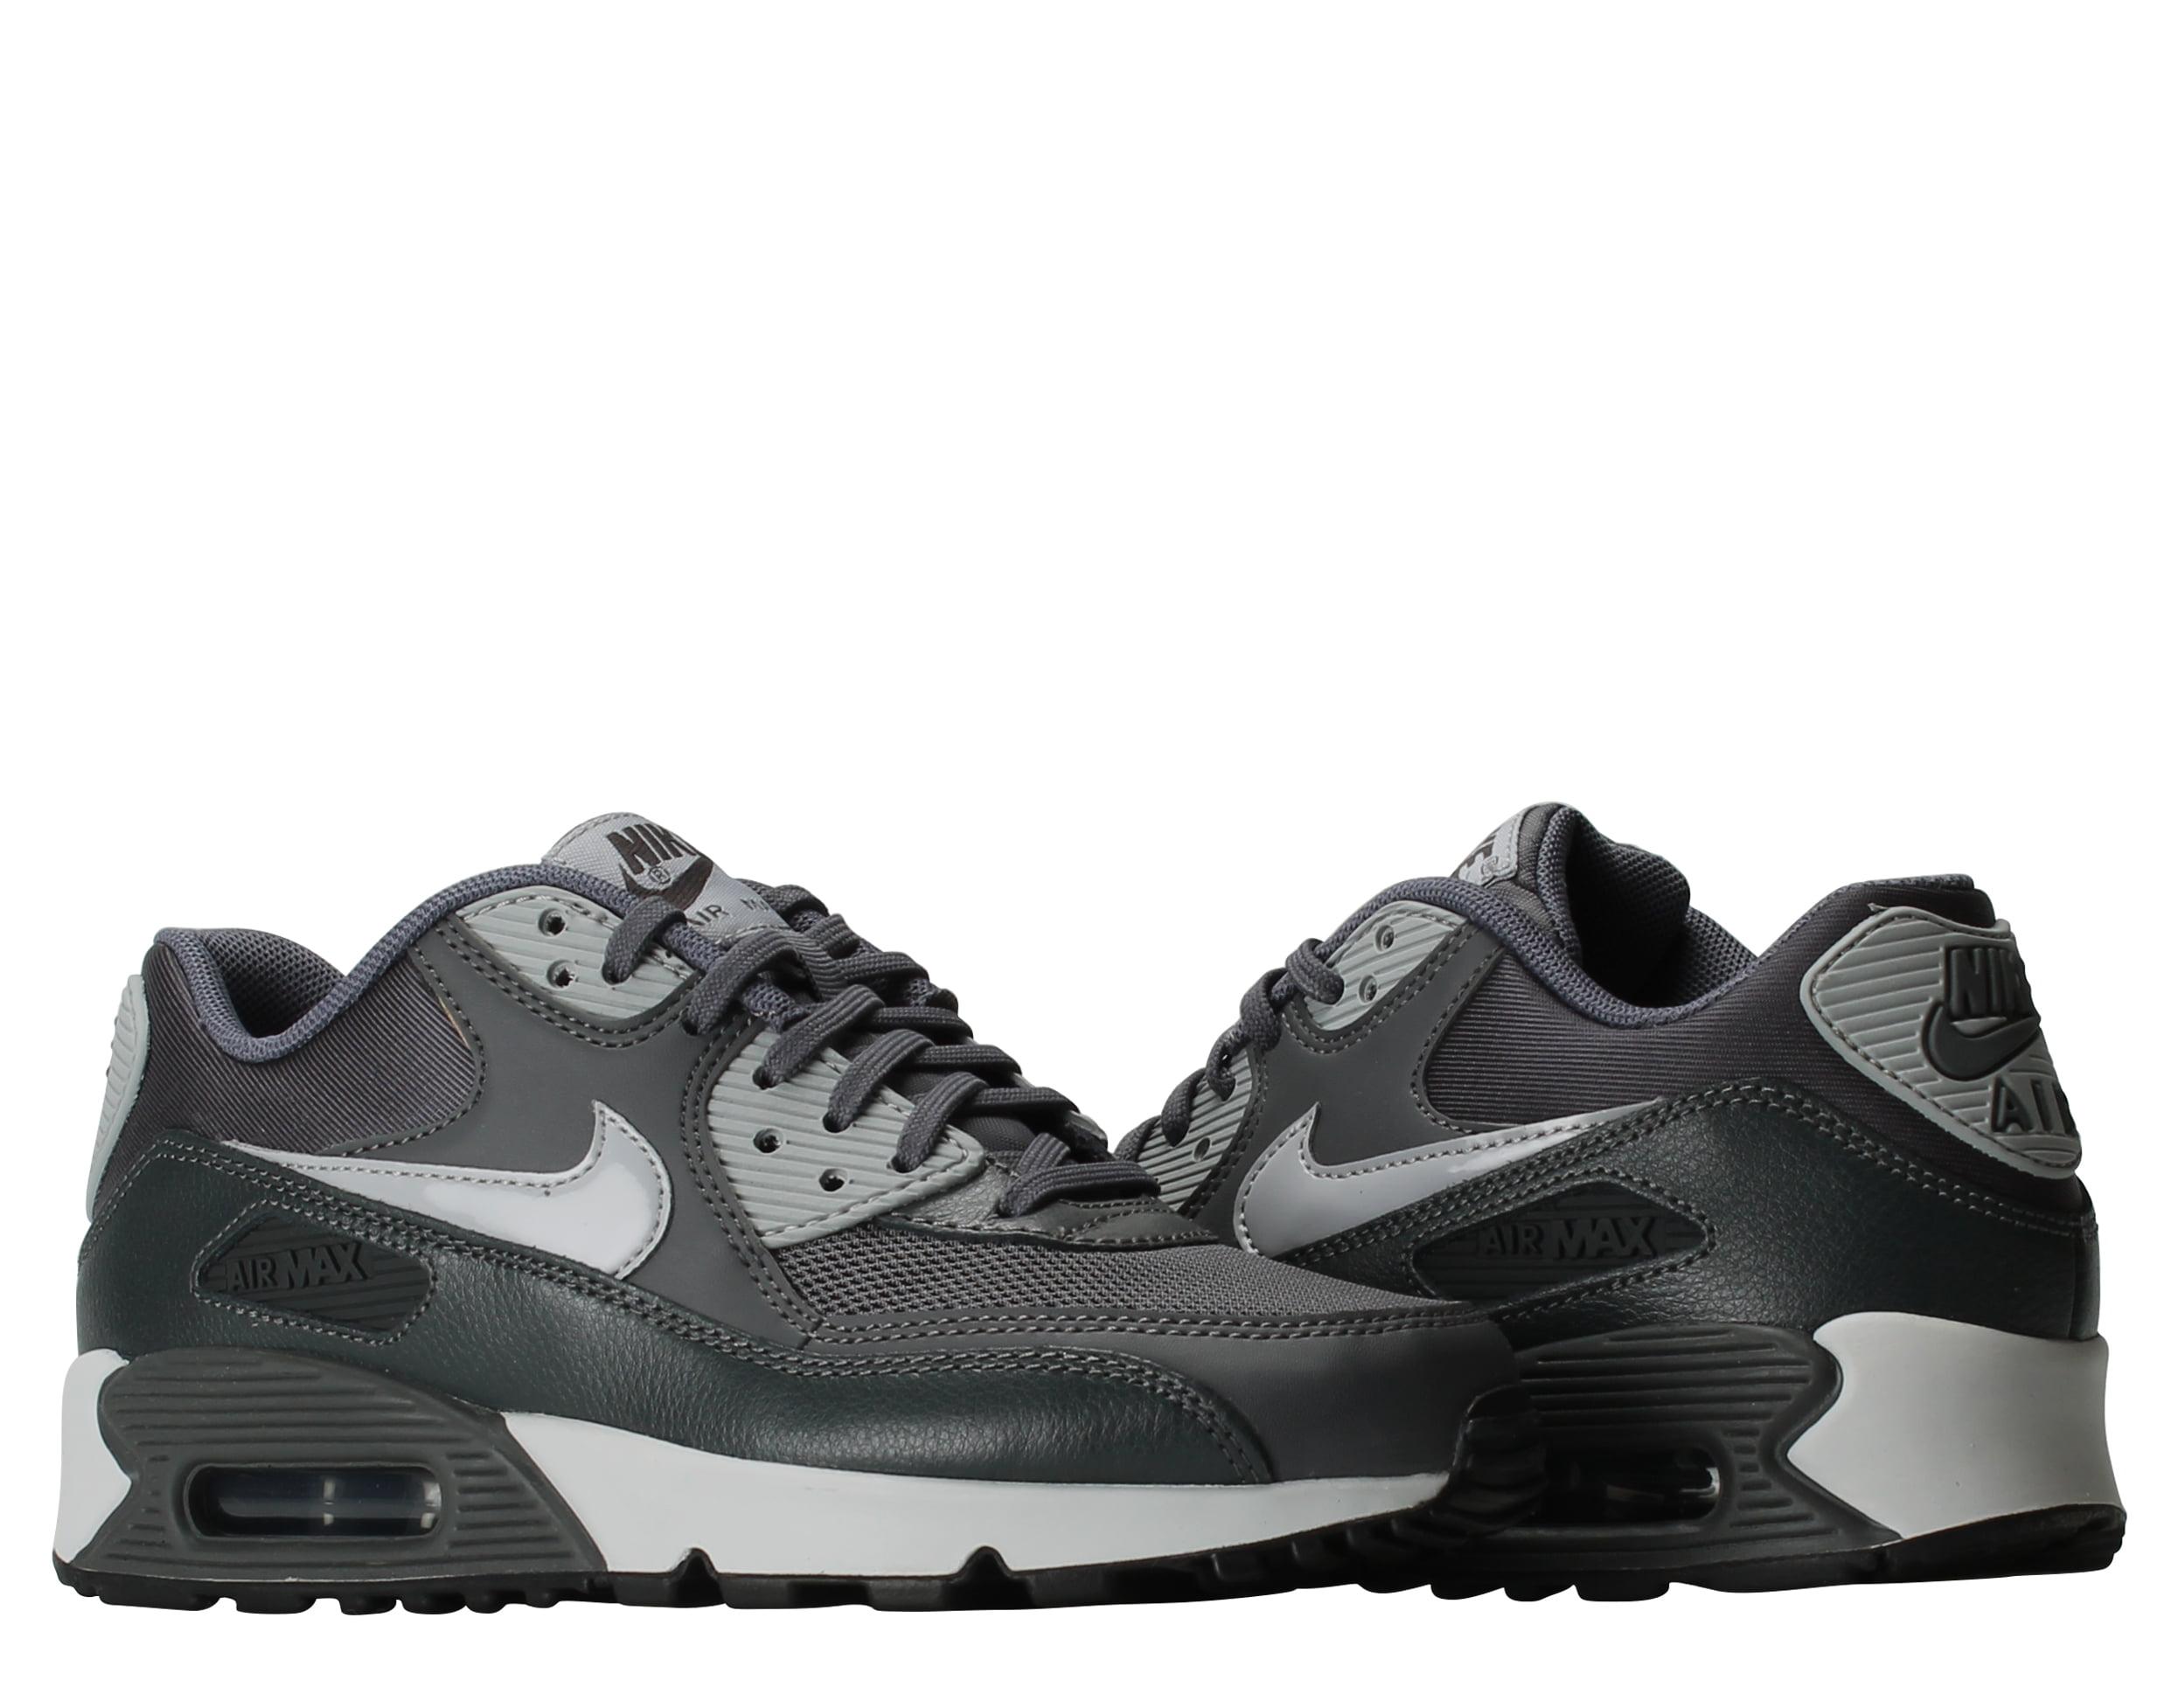 Nike Air Max 90 Essential Dark Grey Wolf Grey Women's Running Shoe 616730-030 by